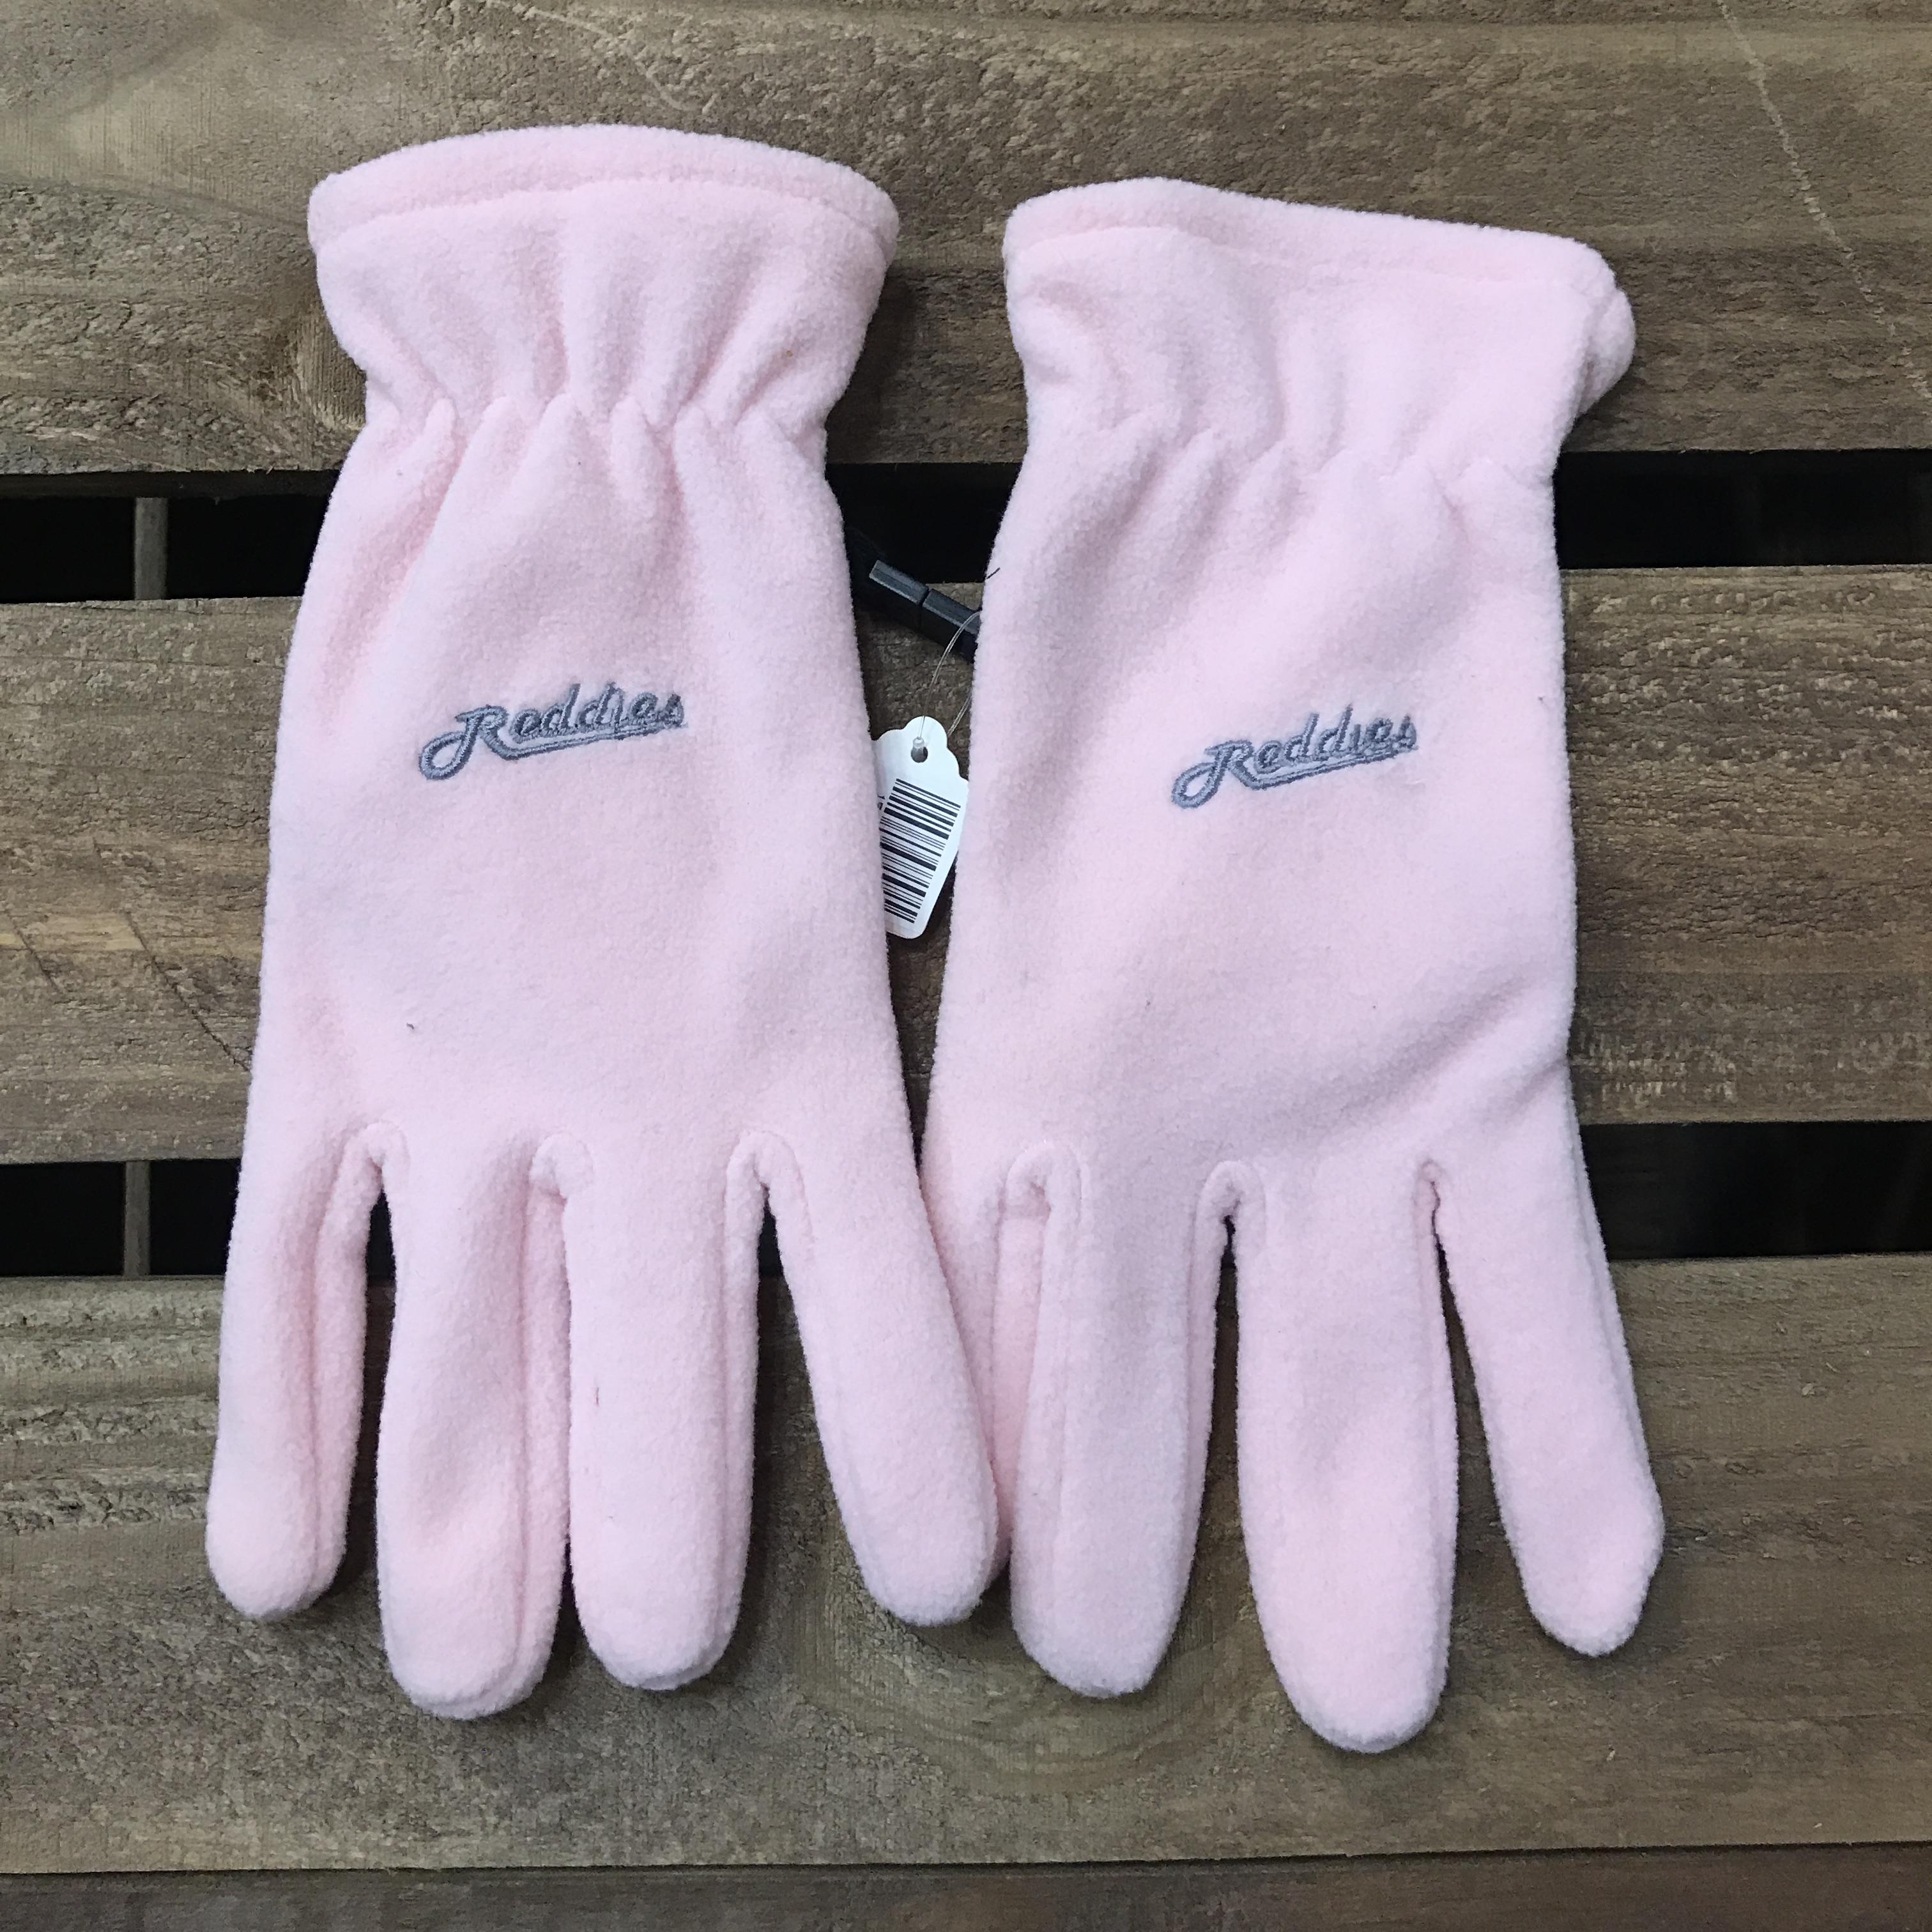 Fleece Reddies Gloves